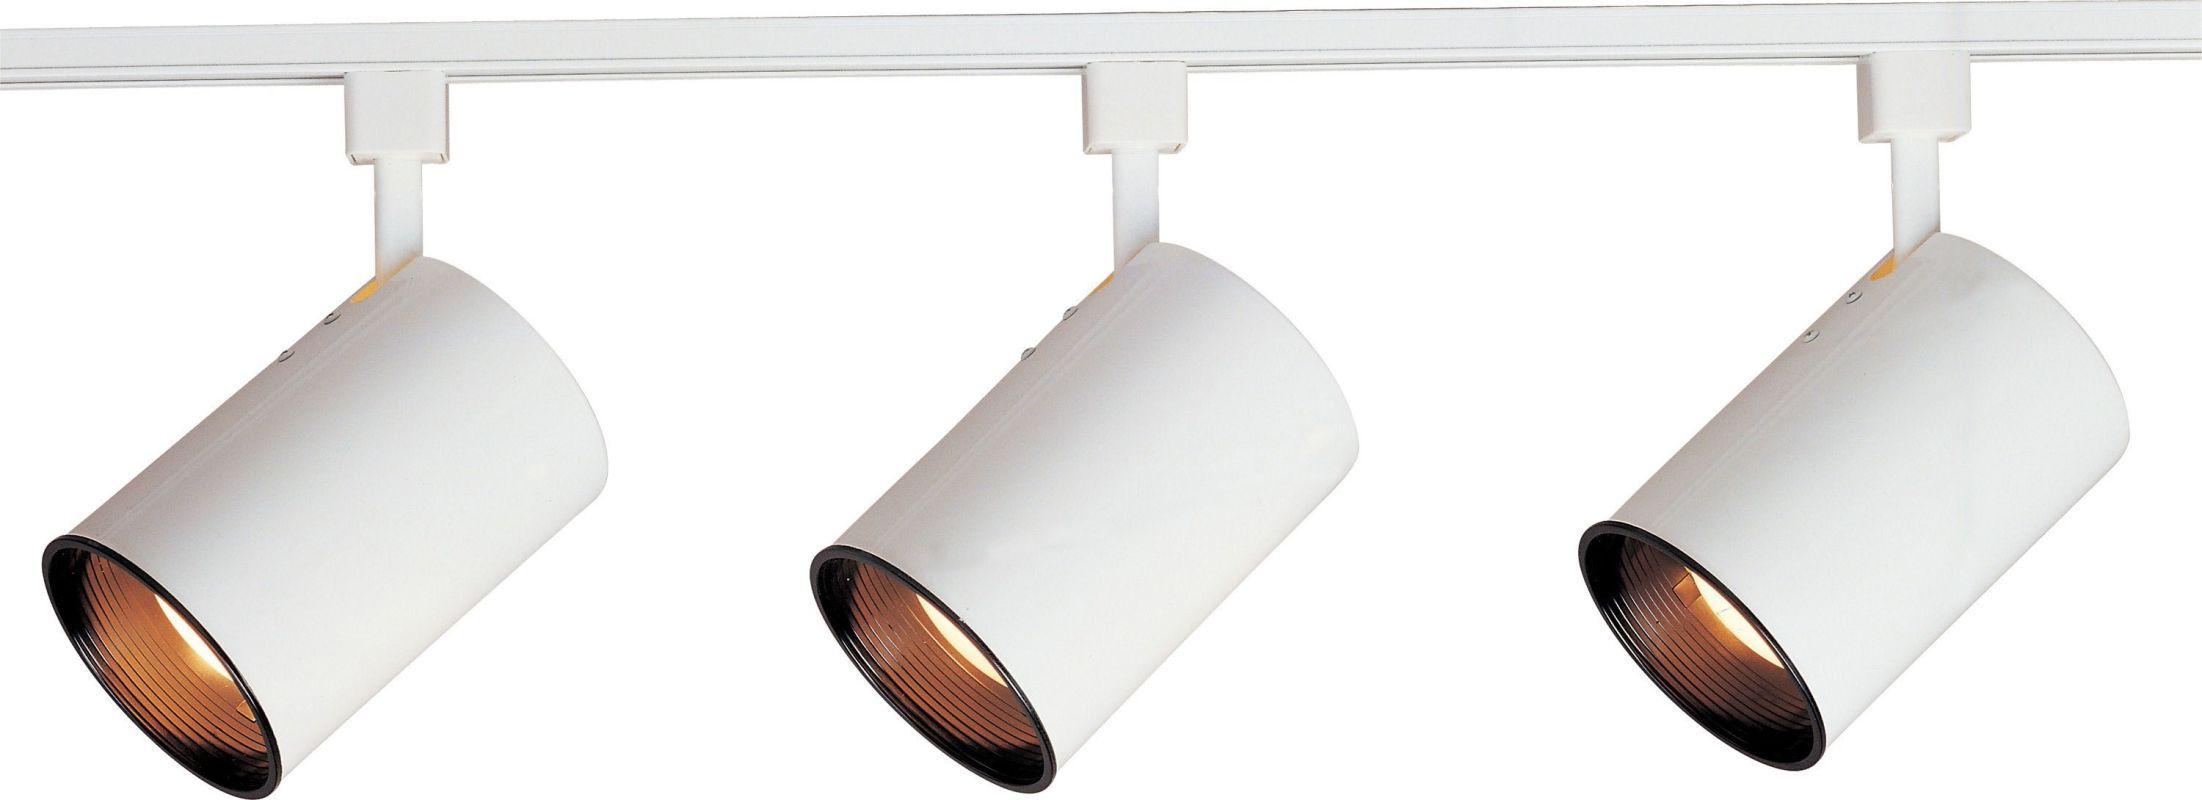 Maxim 92315 Track Collection 3 Light Track Lighting Kit White Indoor ...